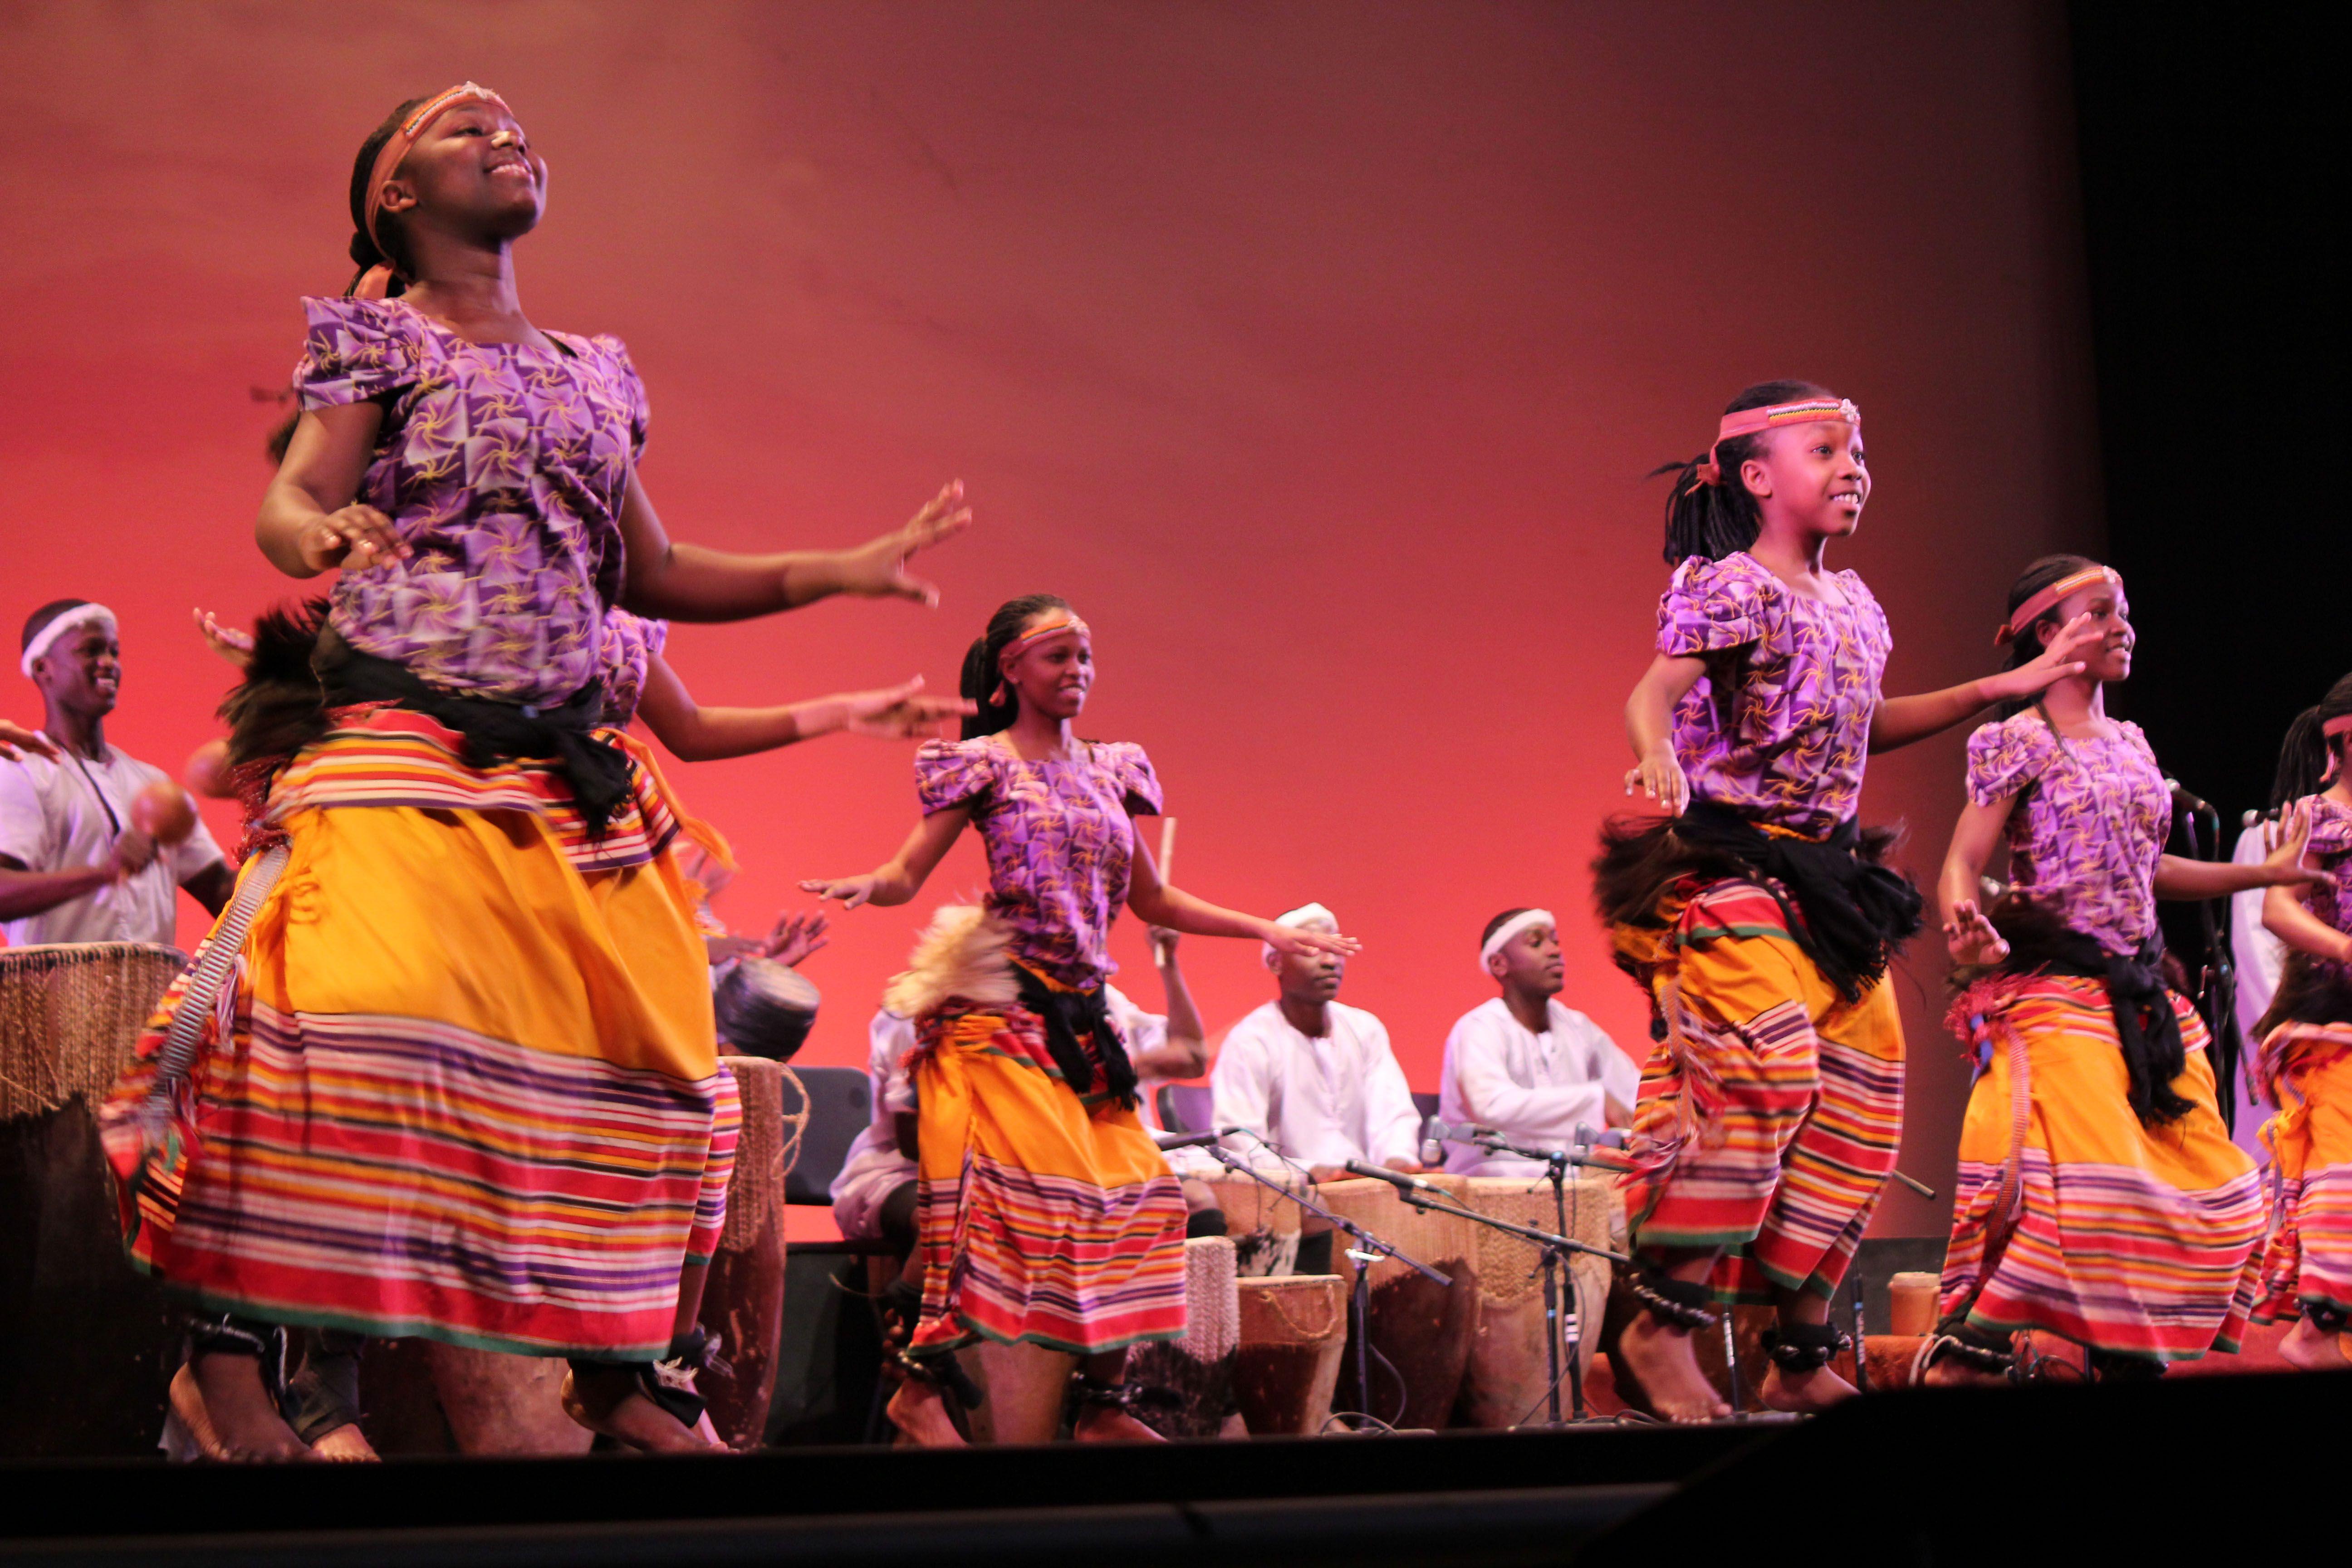 Cultural Safaris in Uganda: The Bakiga (Kiga) people of